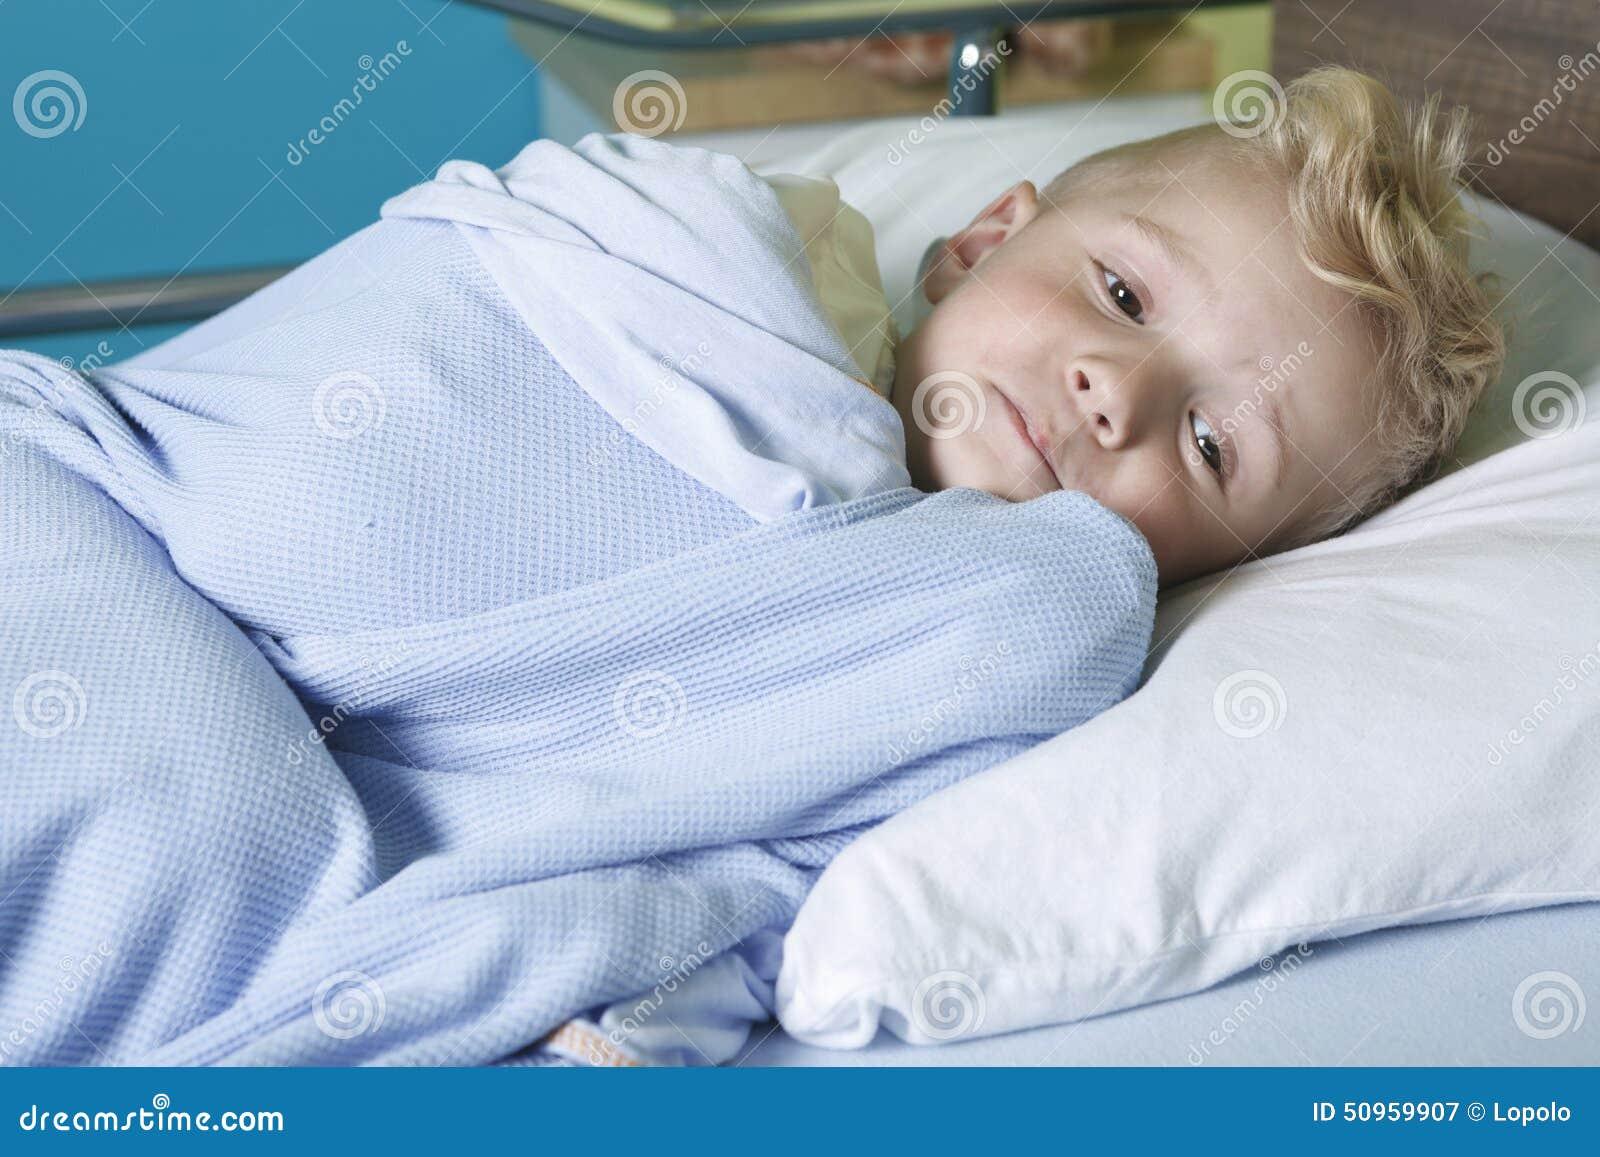 petit gar on malade dans un lit d 39 h pital photo stock. Black Bedroom Furniture Sets. Home Design Ideas